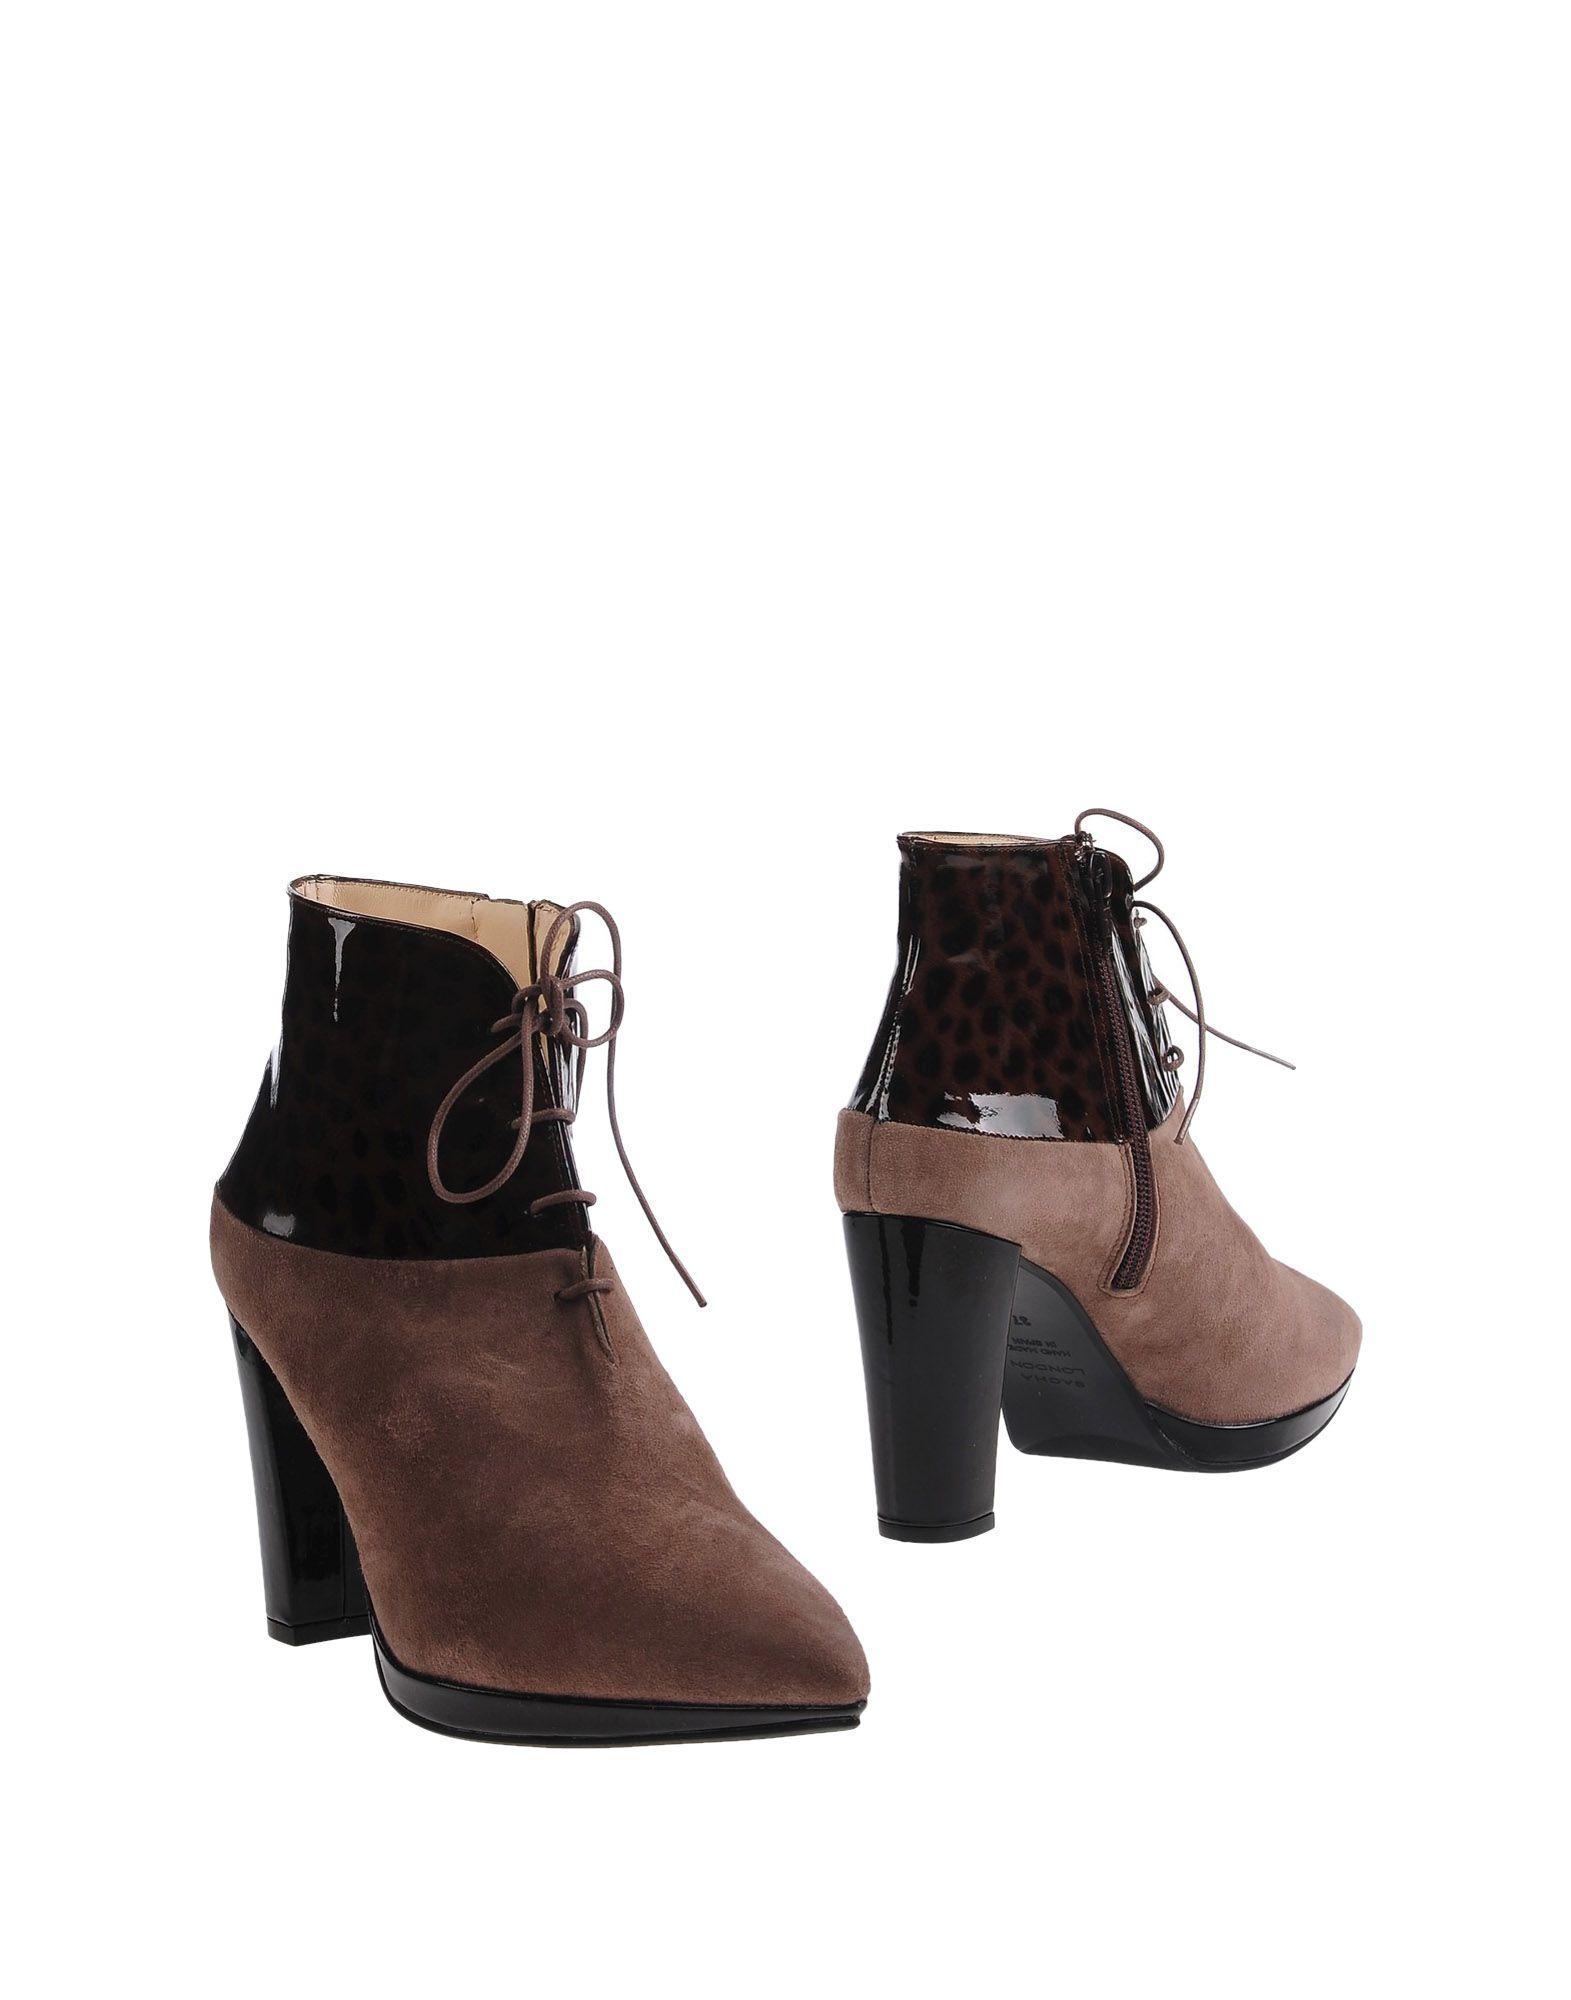 Sacha London Stiefelette Damen  11307929AO Gute Qualität beliebte Schuhe